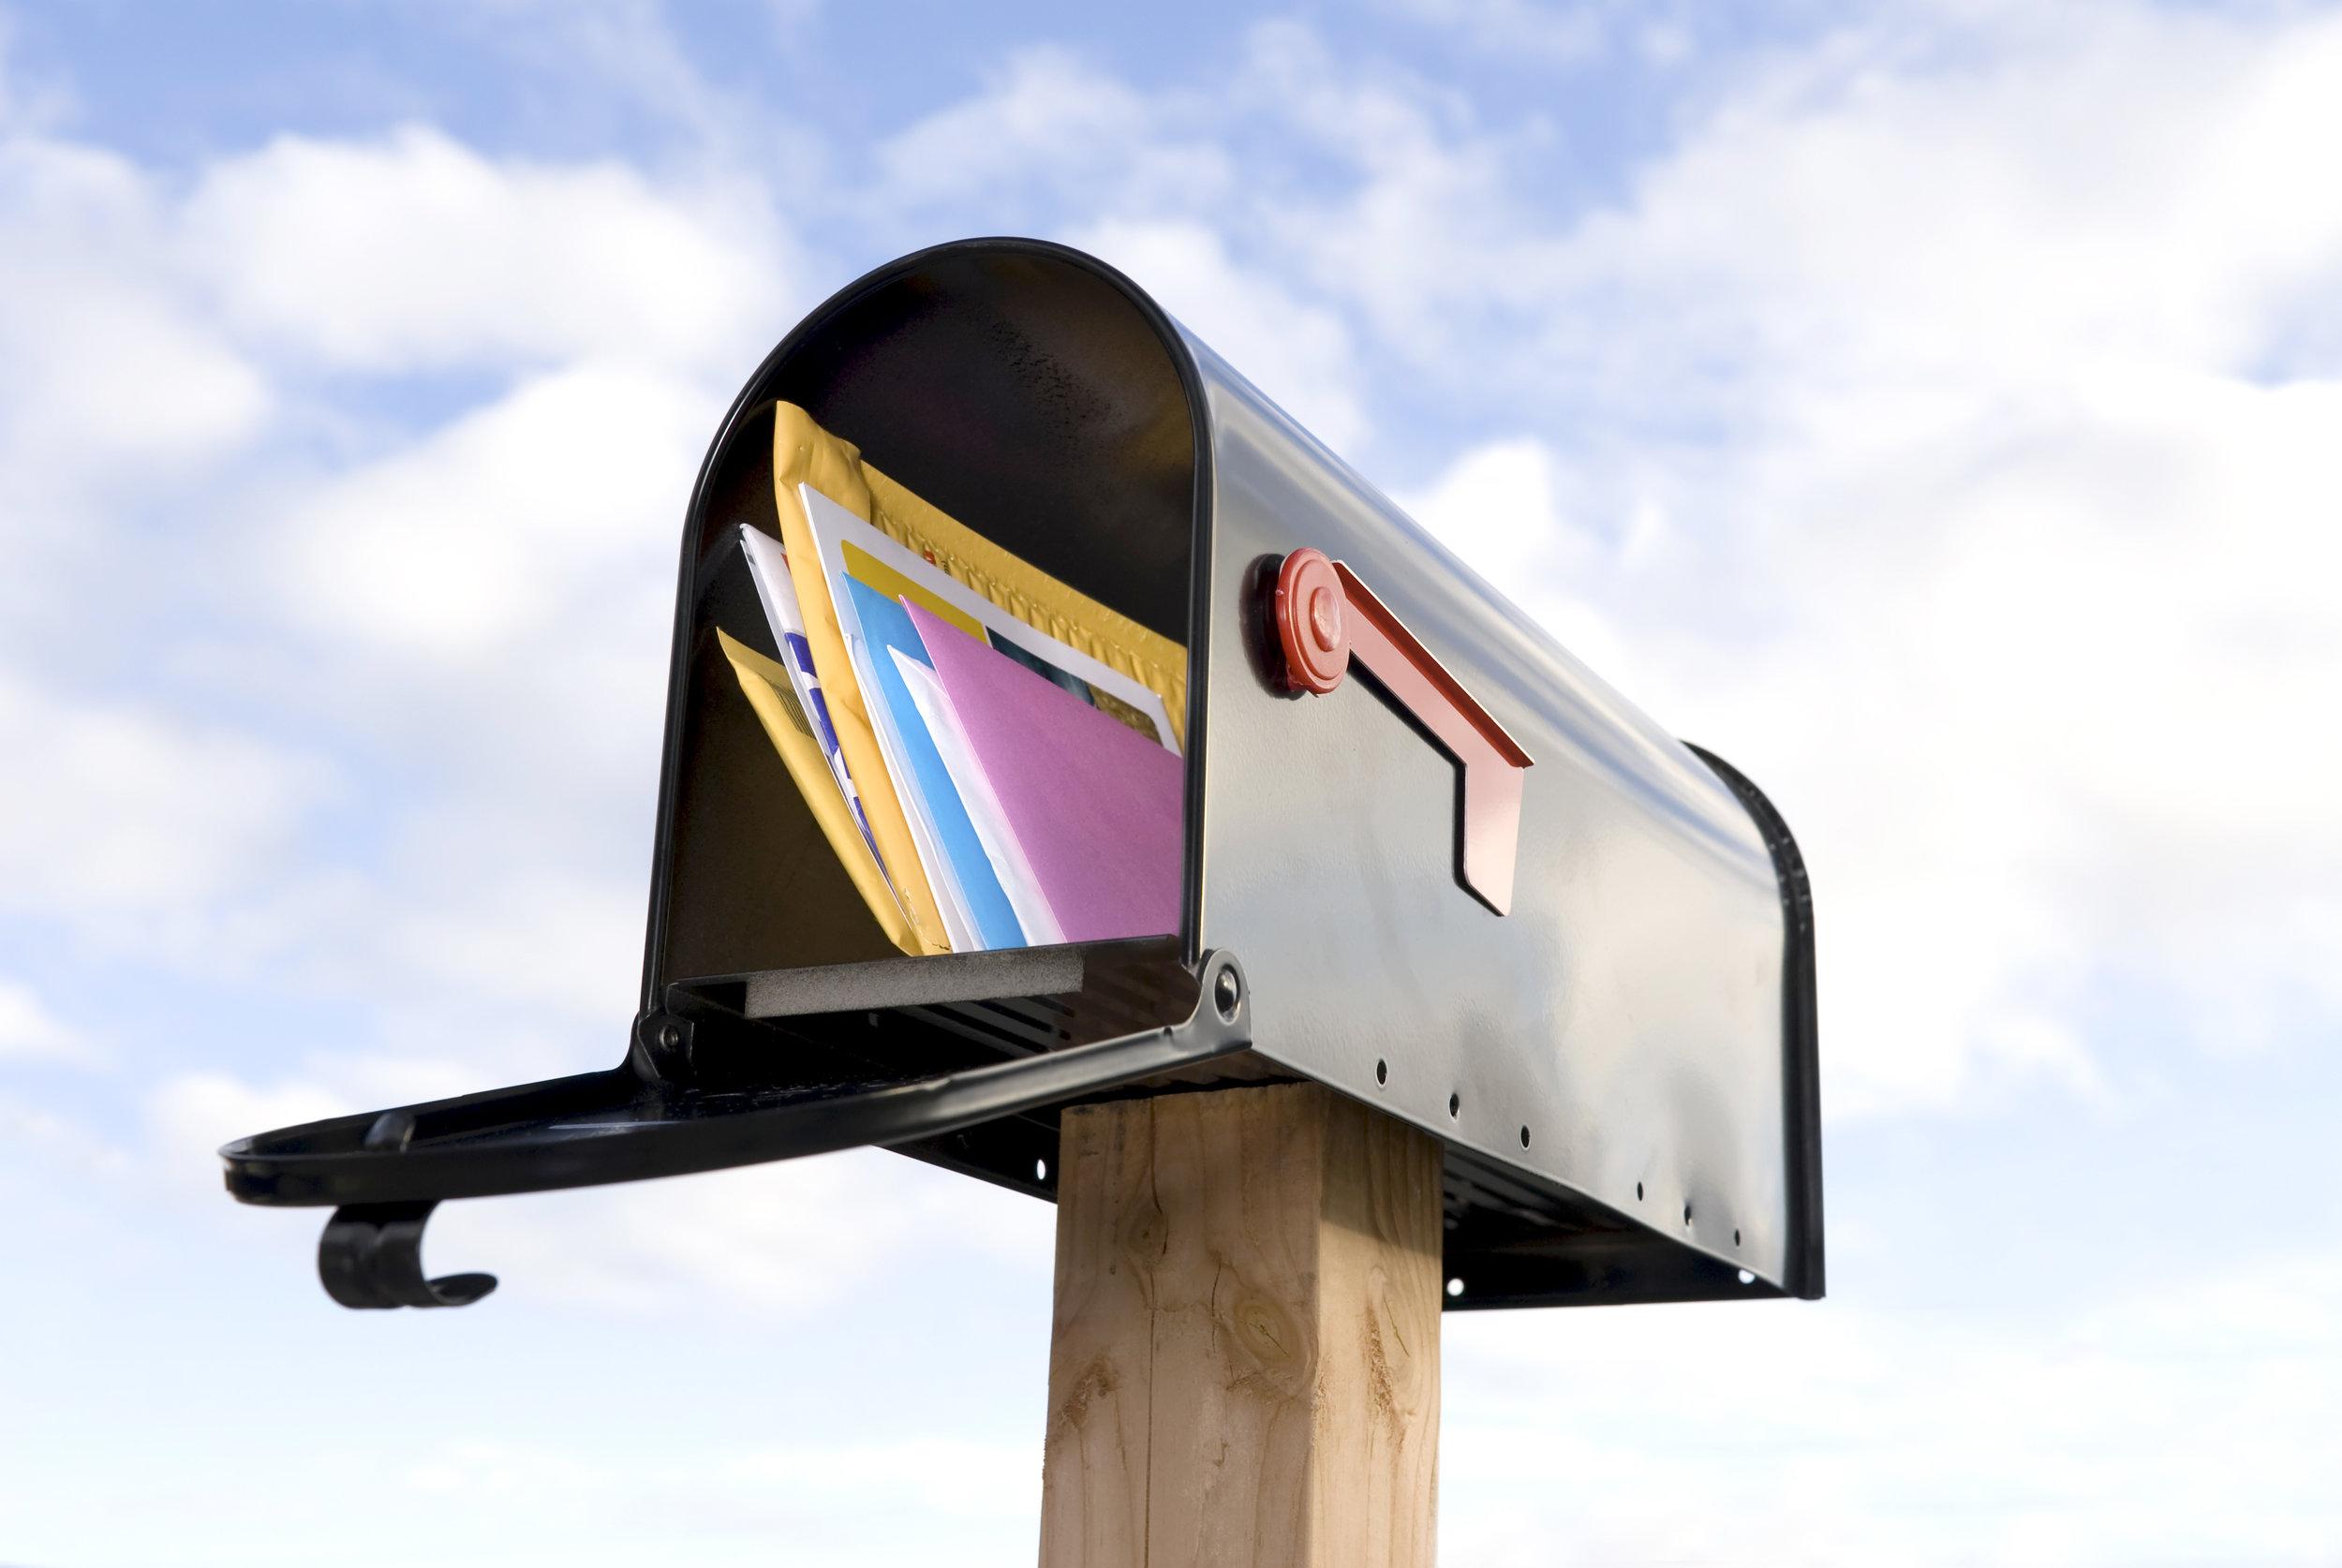 mailbox-and-mail-XF2BWSC.jpg